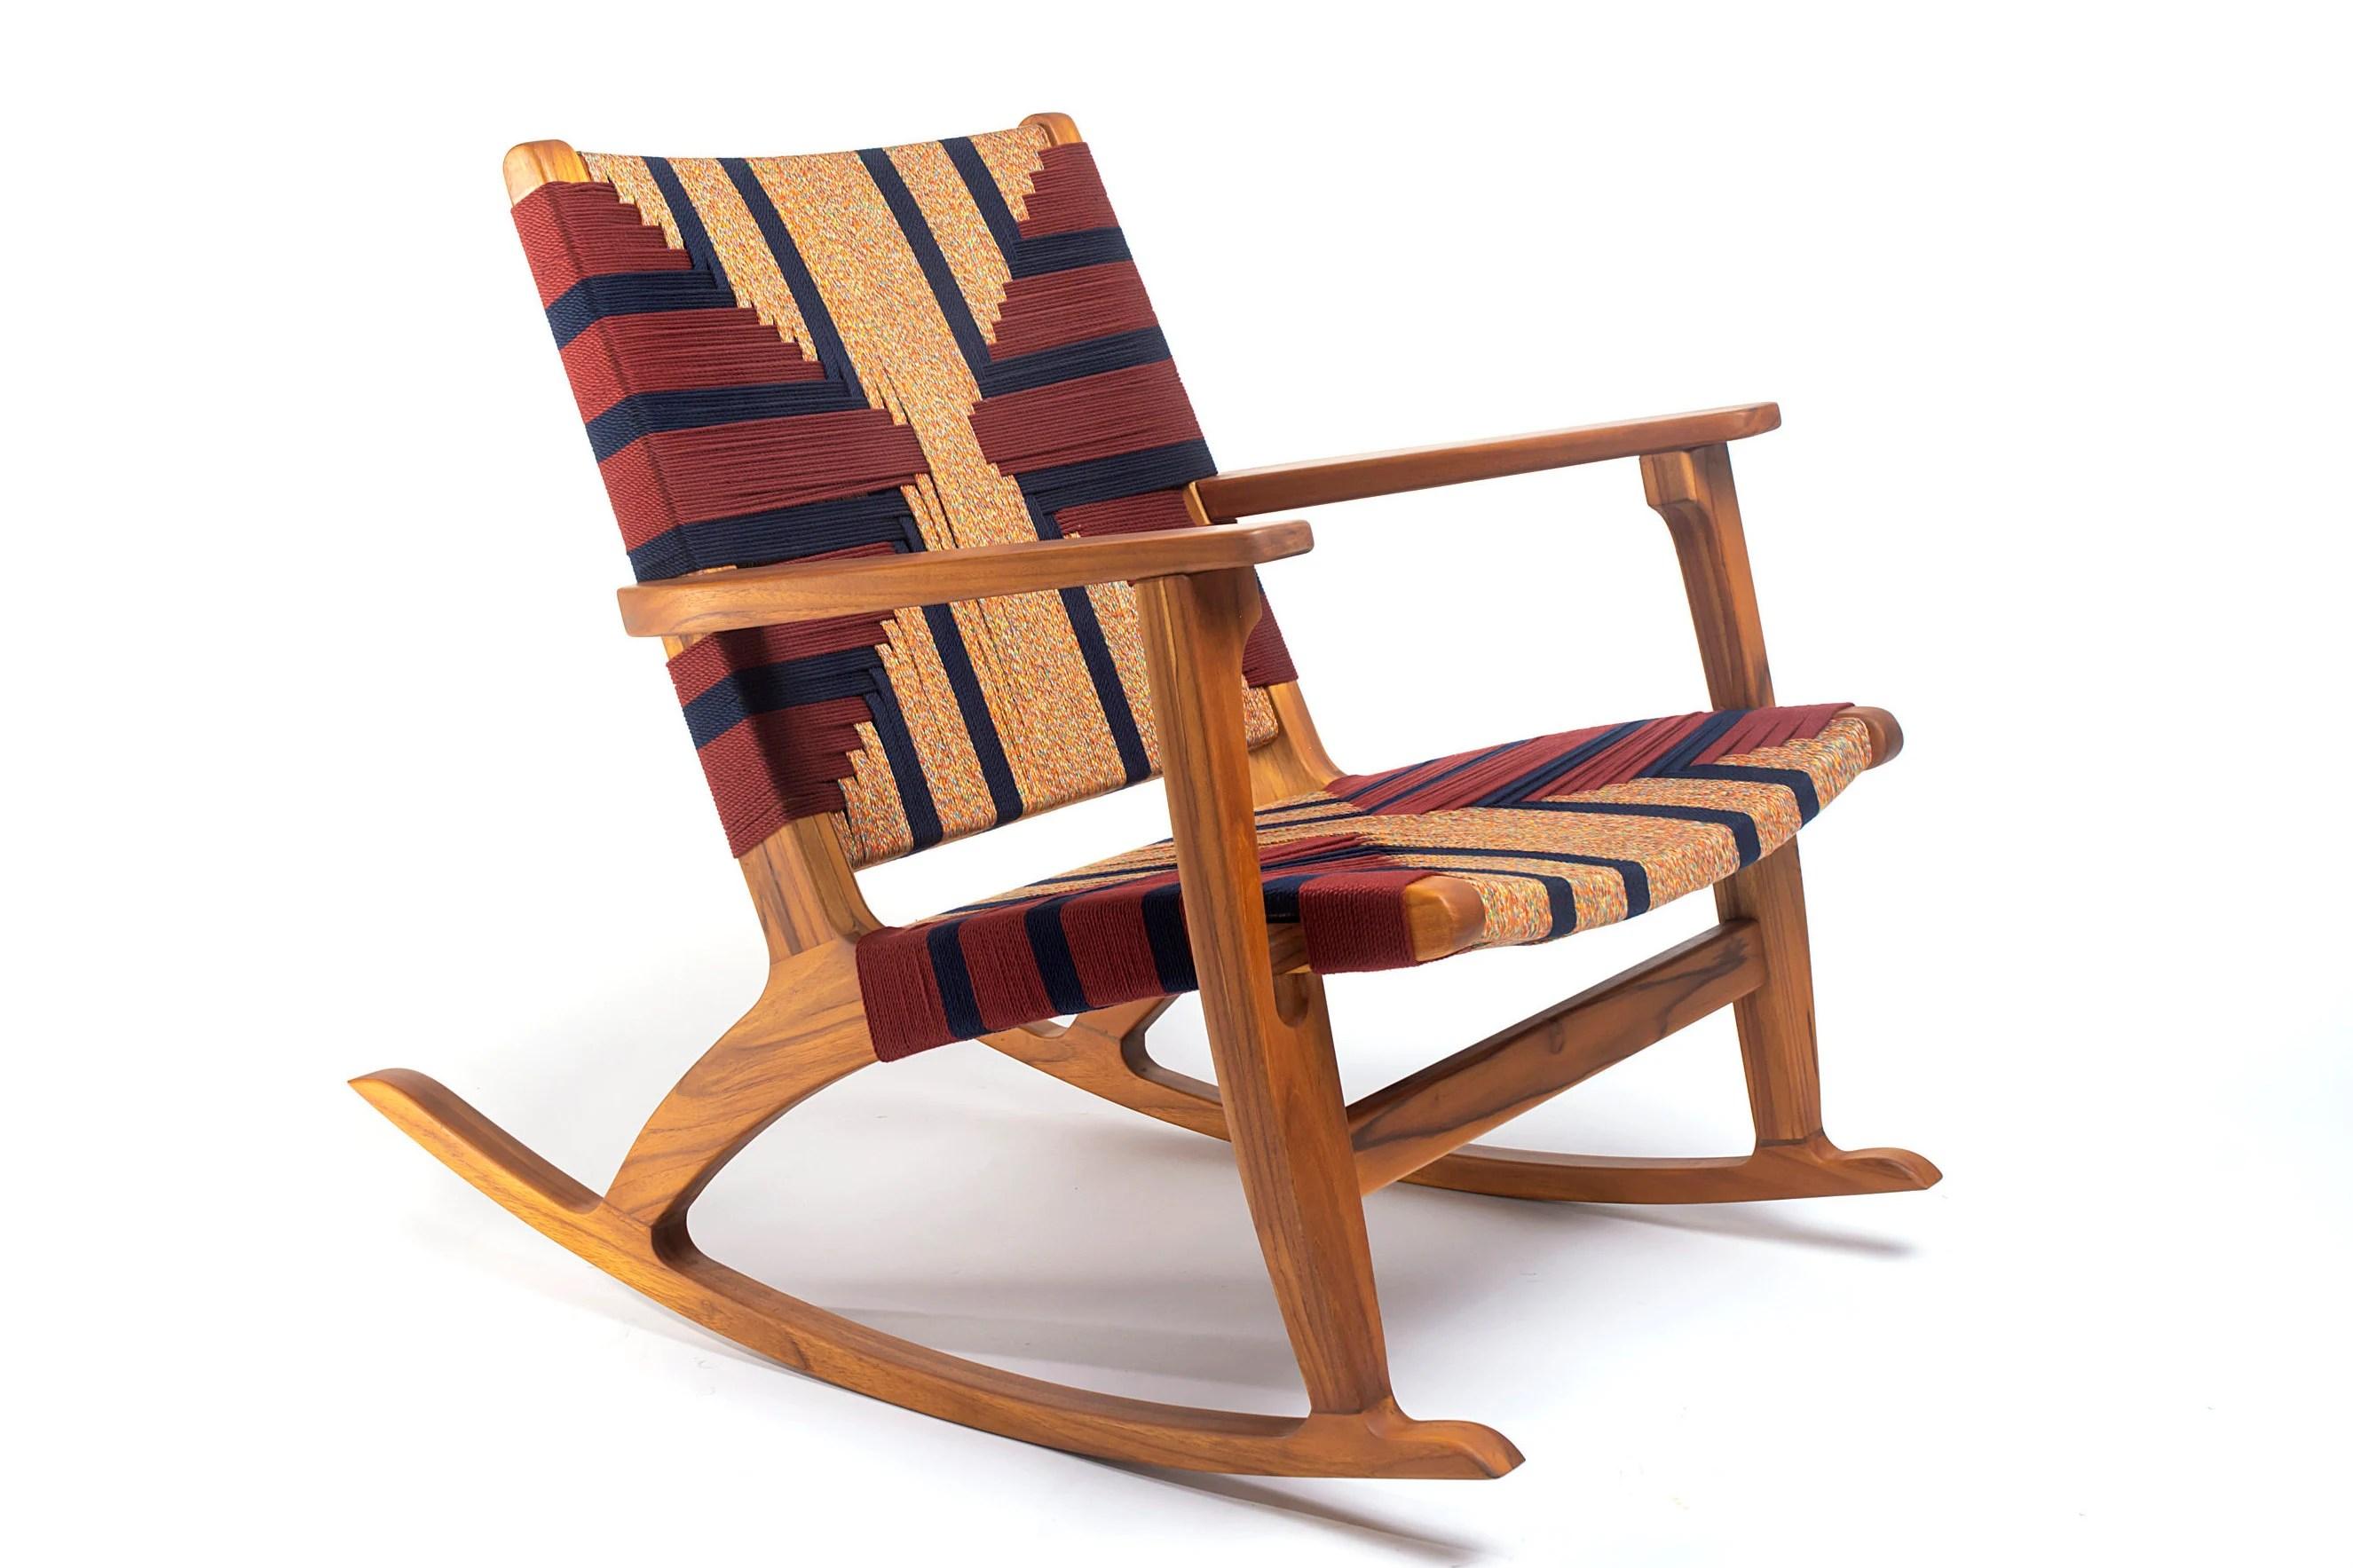 handmade rocking chairs ergonomic recliner chair custom woven pattern eco friendly etsy 50